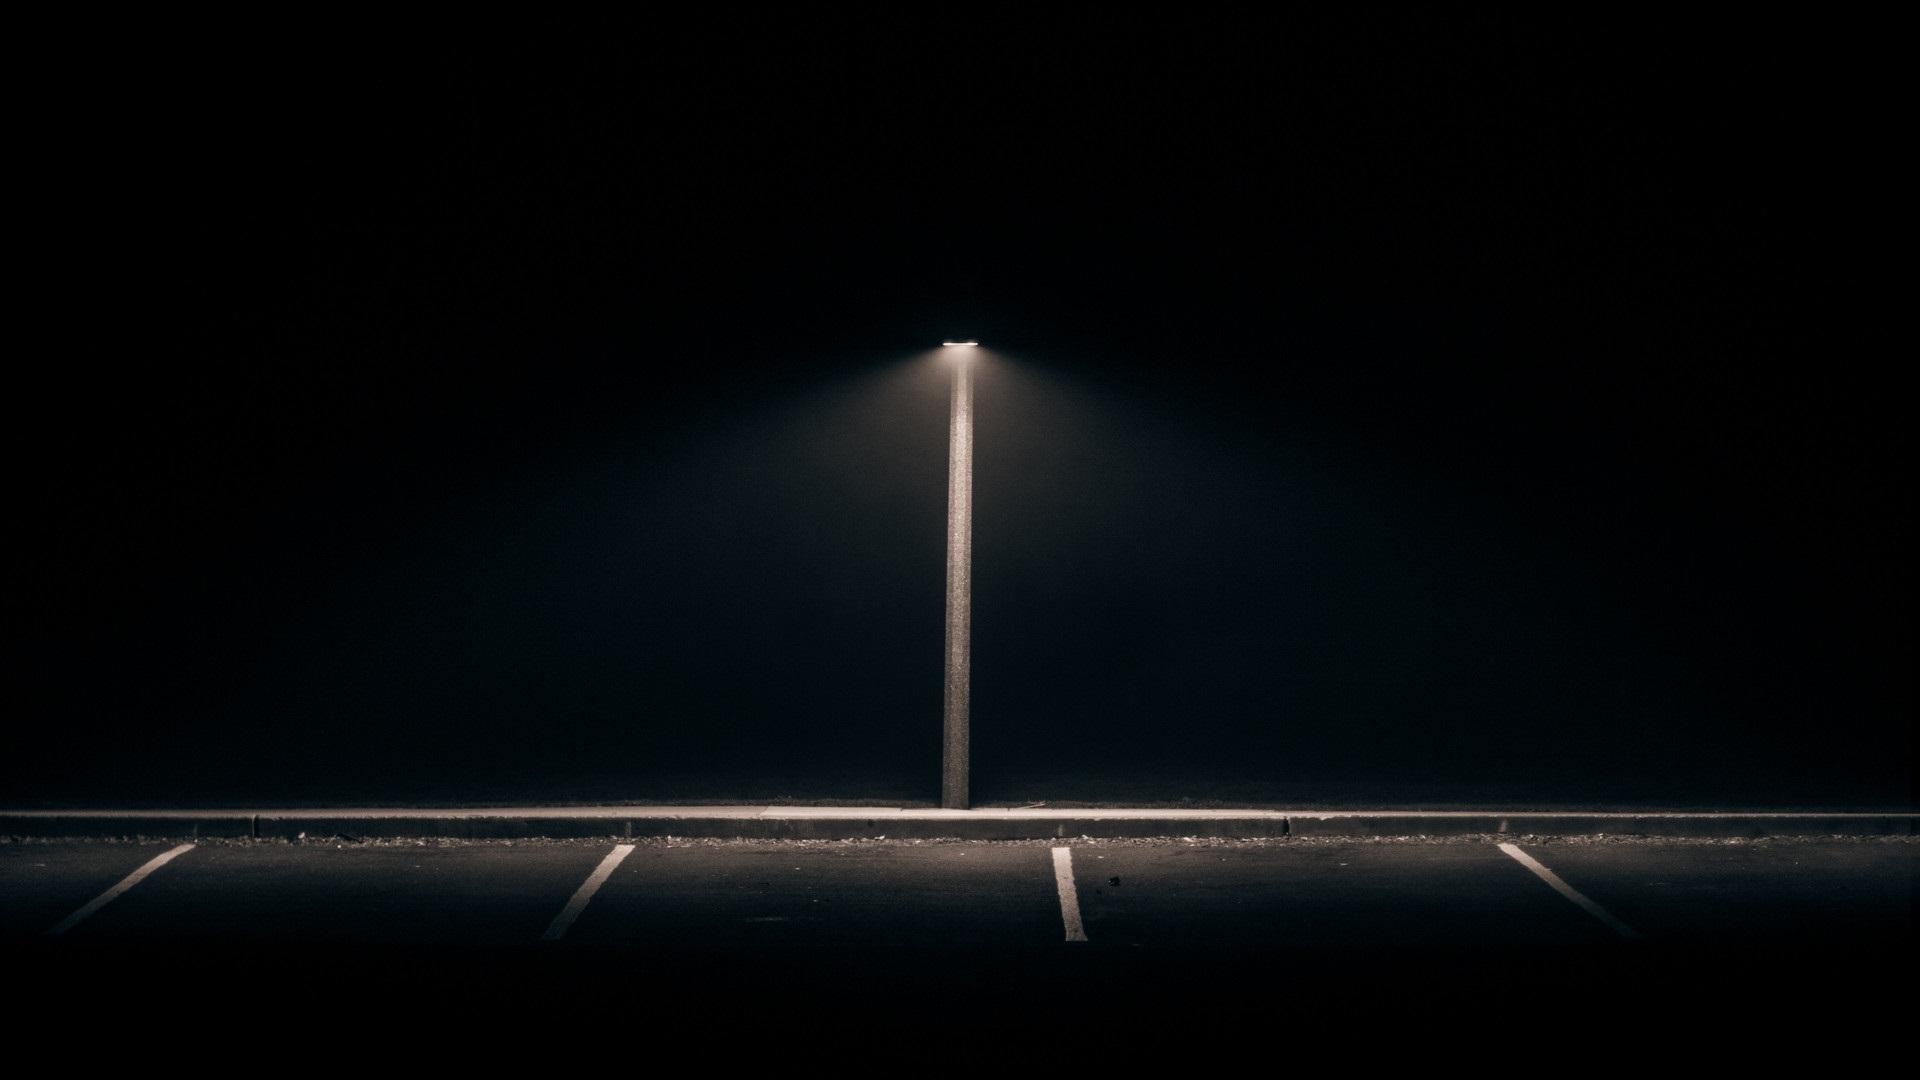 Wallpaper Sunlight Lights Street Light Monochrome Black Background Dark Night Minimalism Abandoned Reflection Photography Symmetry Lamp